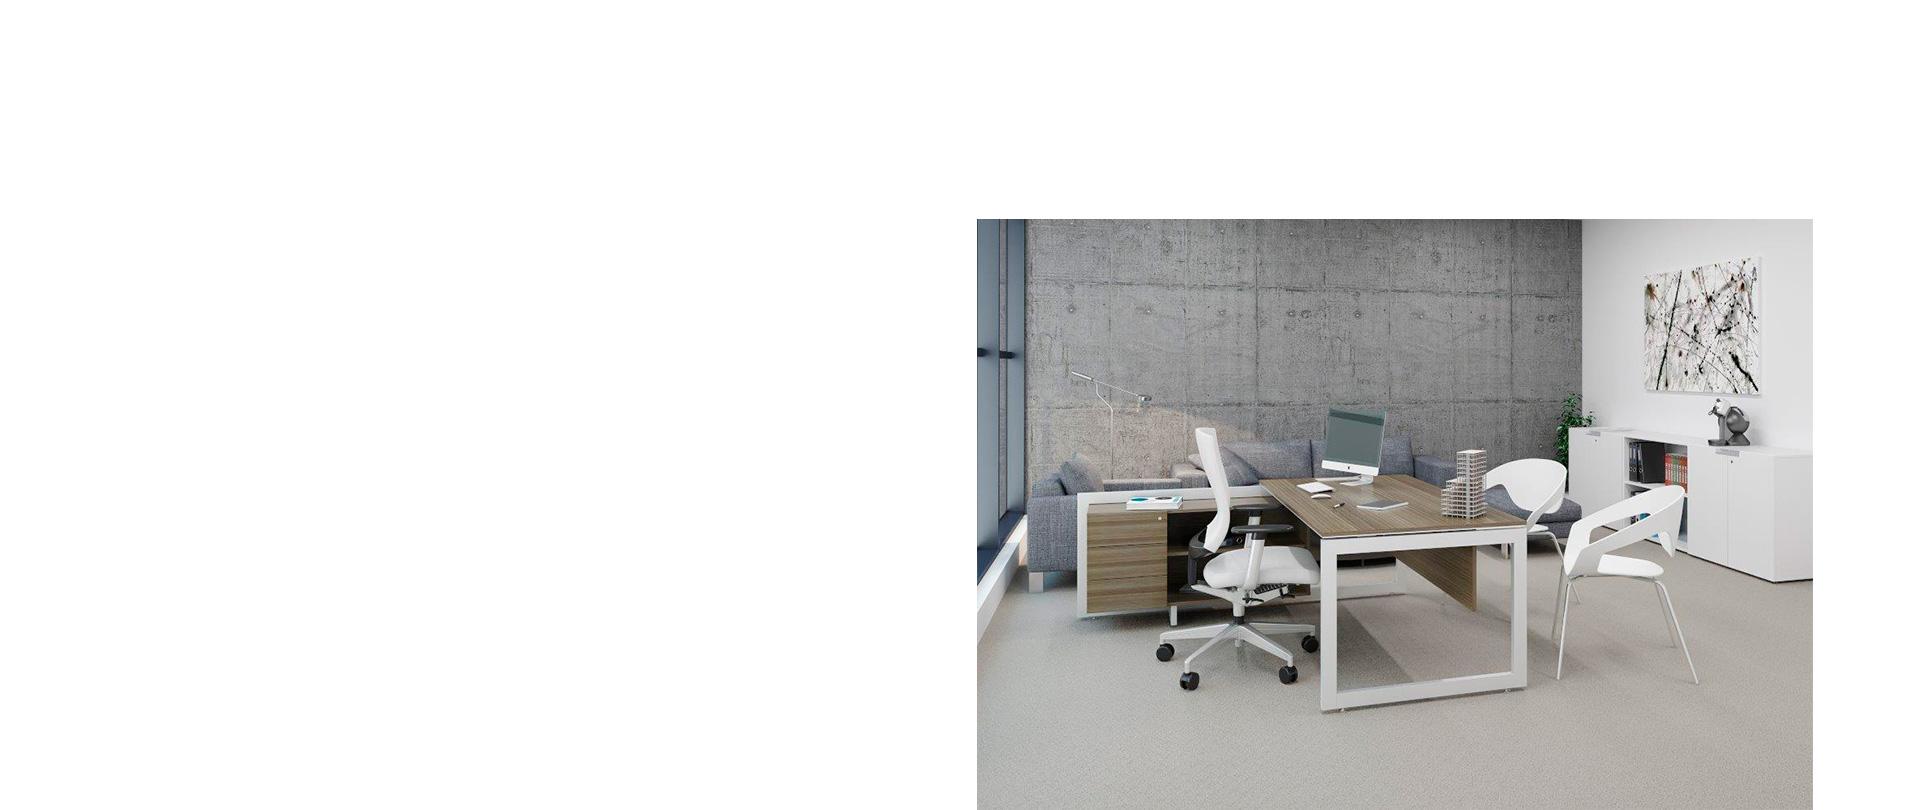 Muebles de oficina wizzy obtenga ideas dise o de muebles for Muebles de oficina xalapa